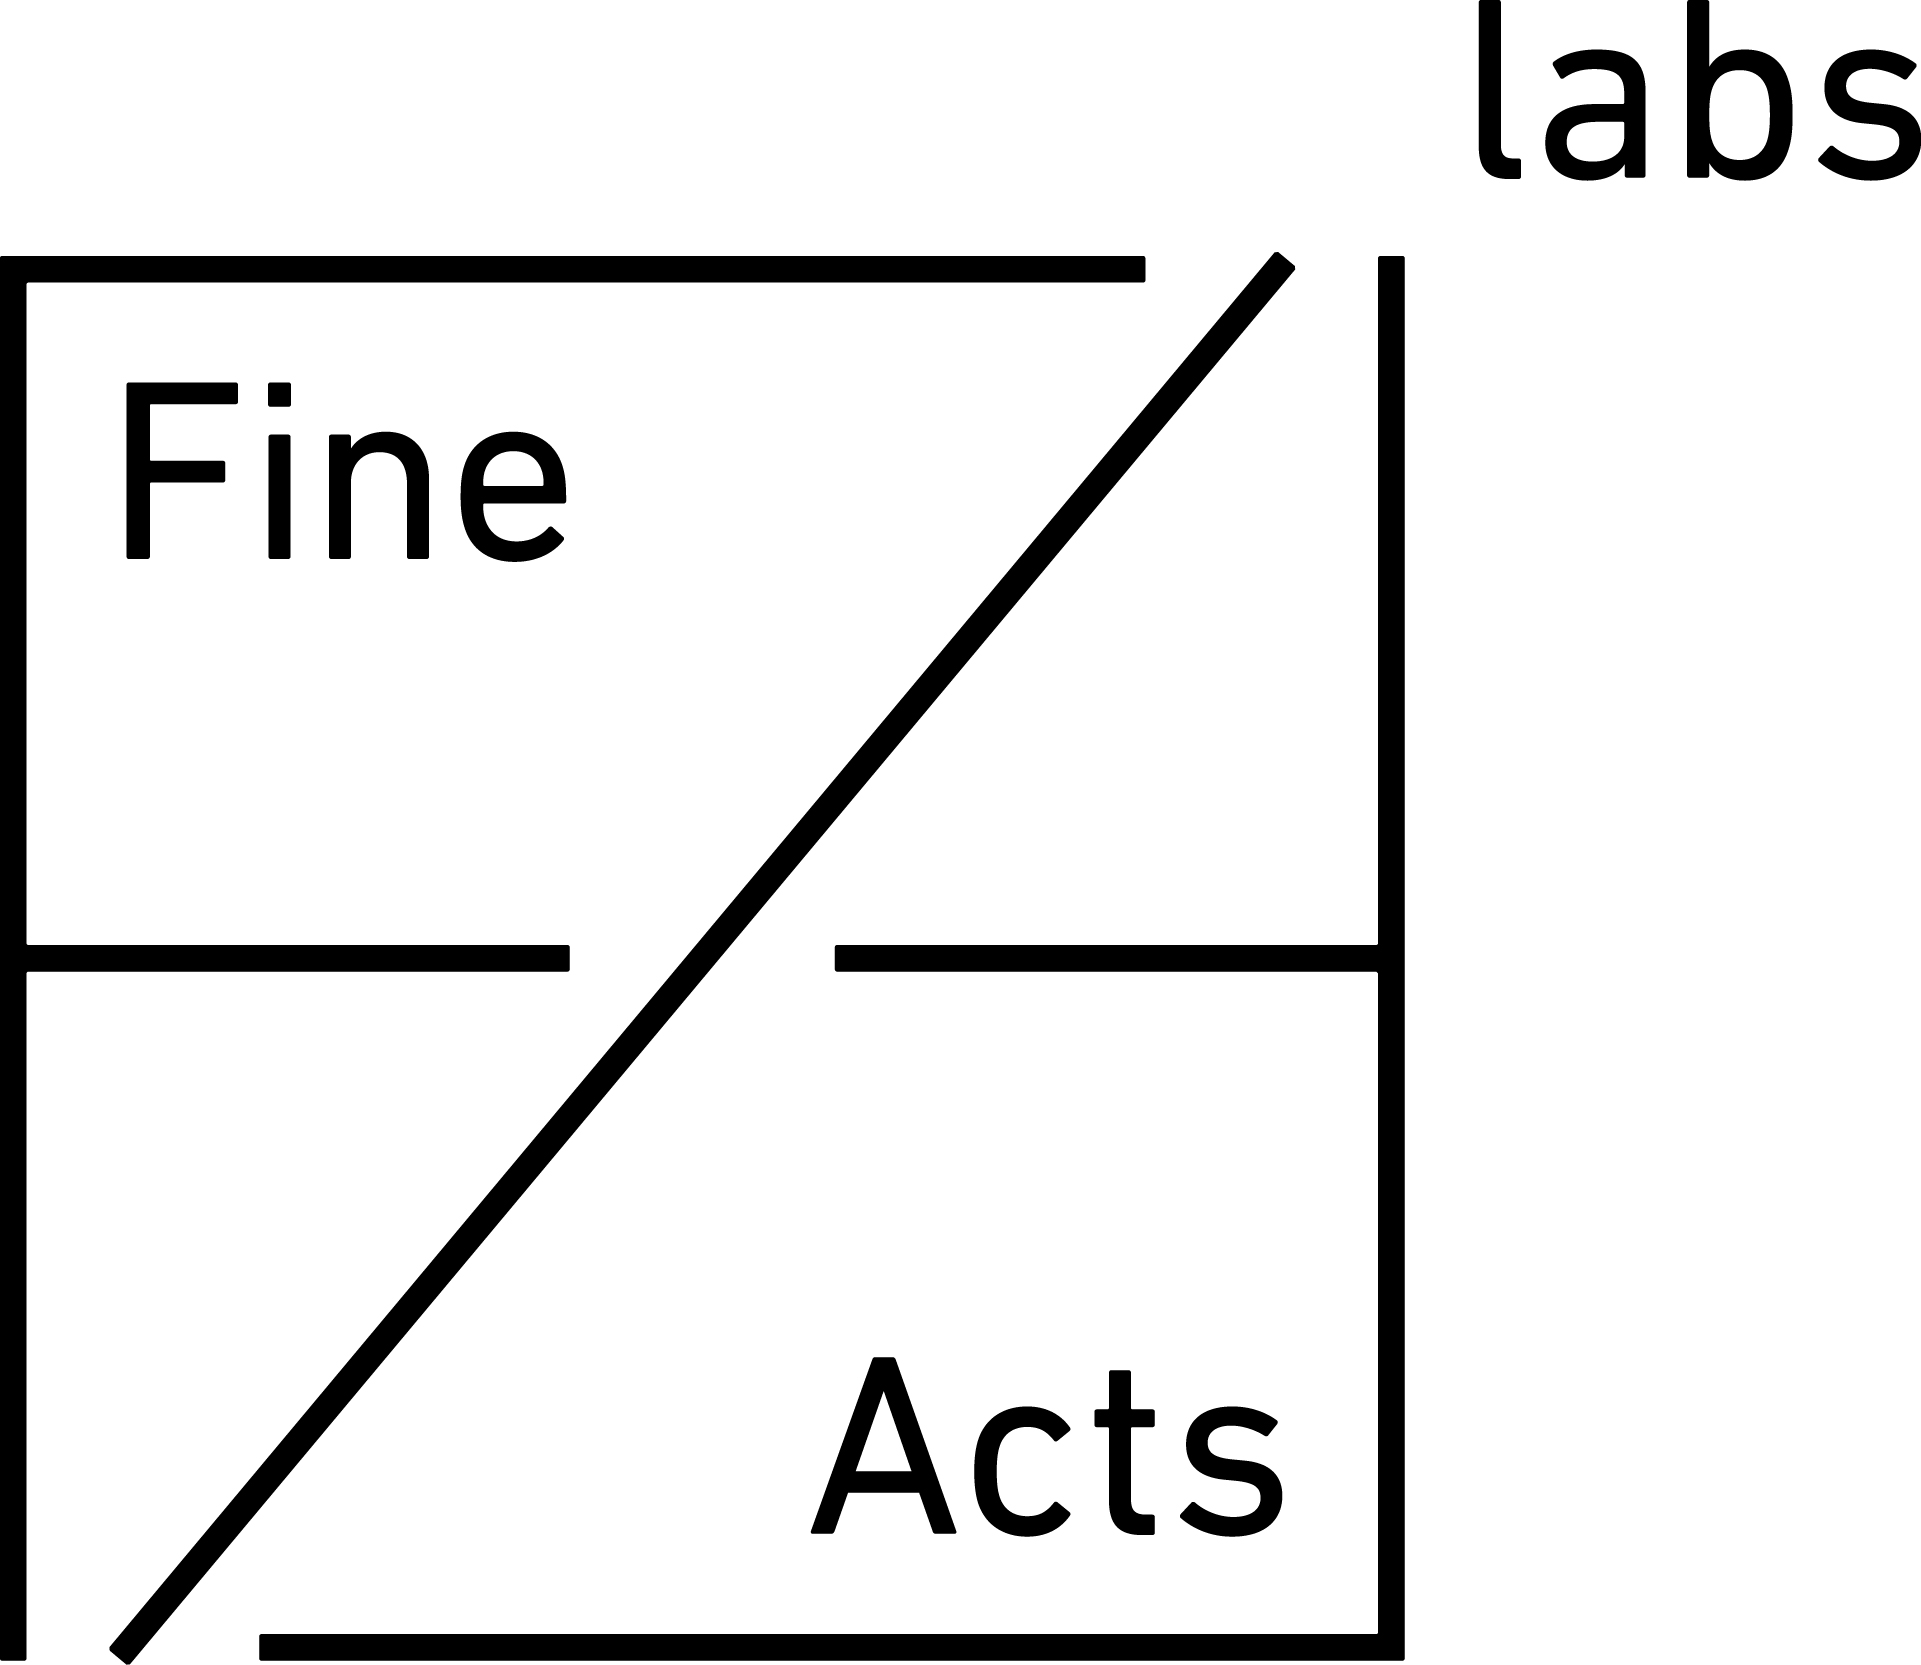 Fine_Acts_LAB_Logo_CMYK.jpg